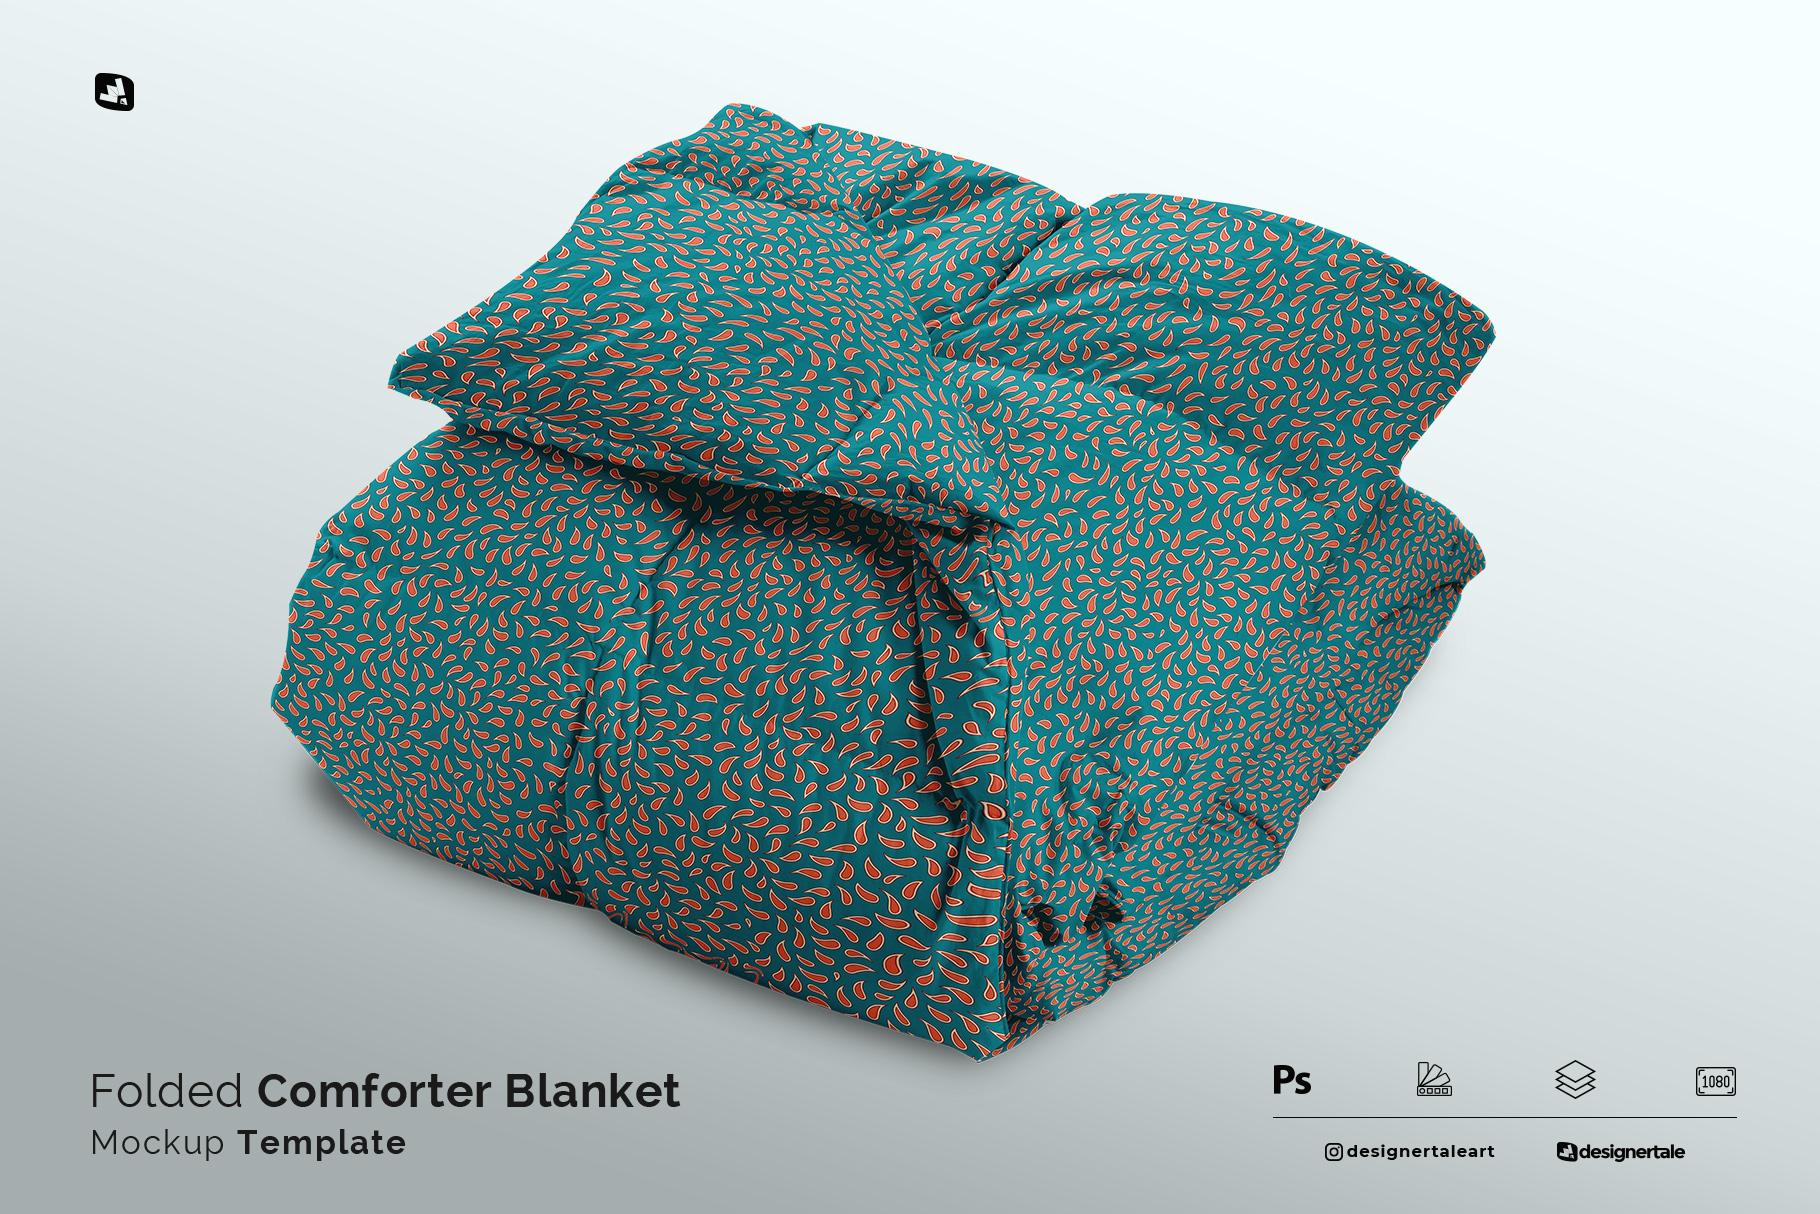 folded comforter blanket mockup